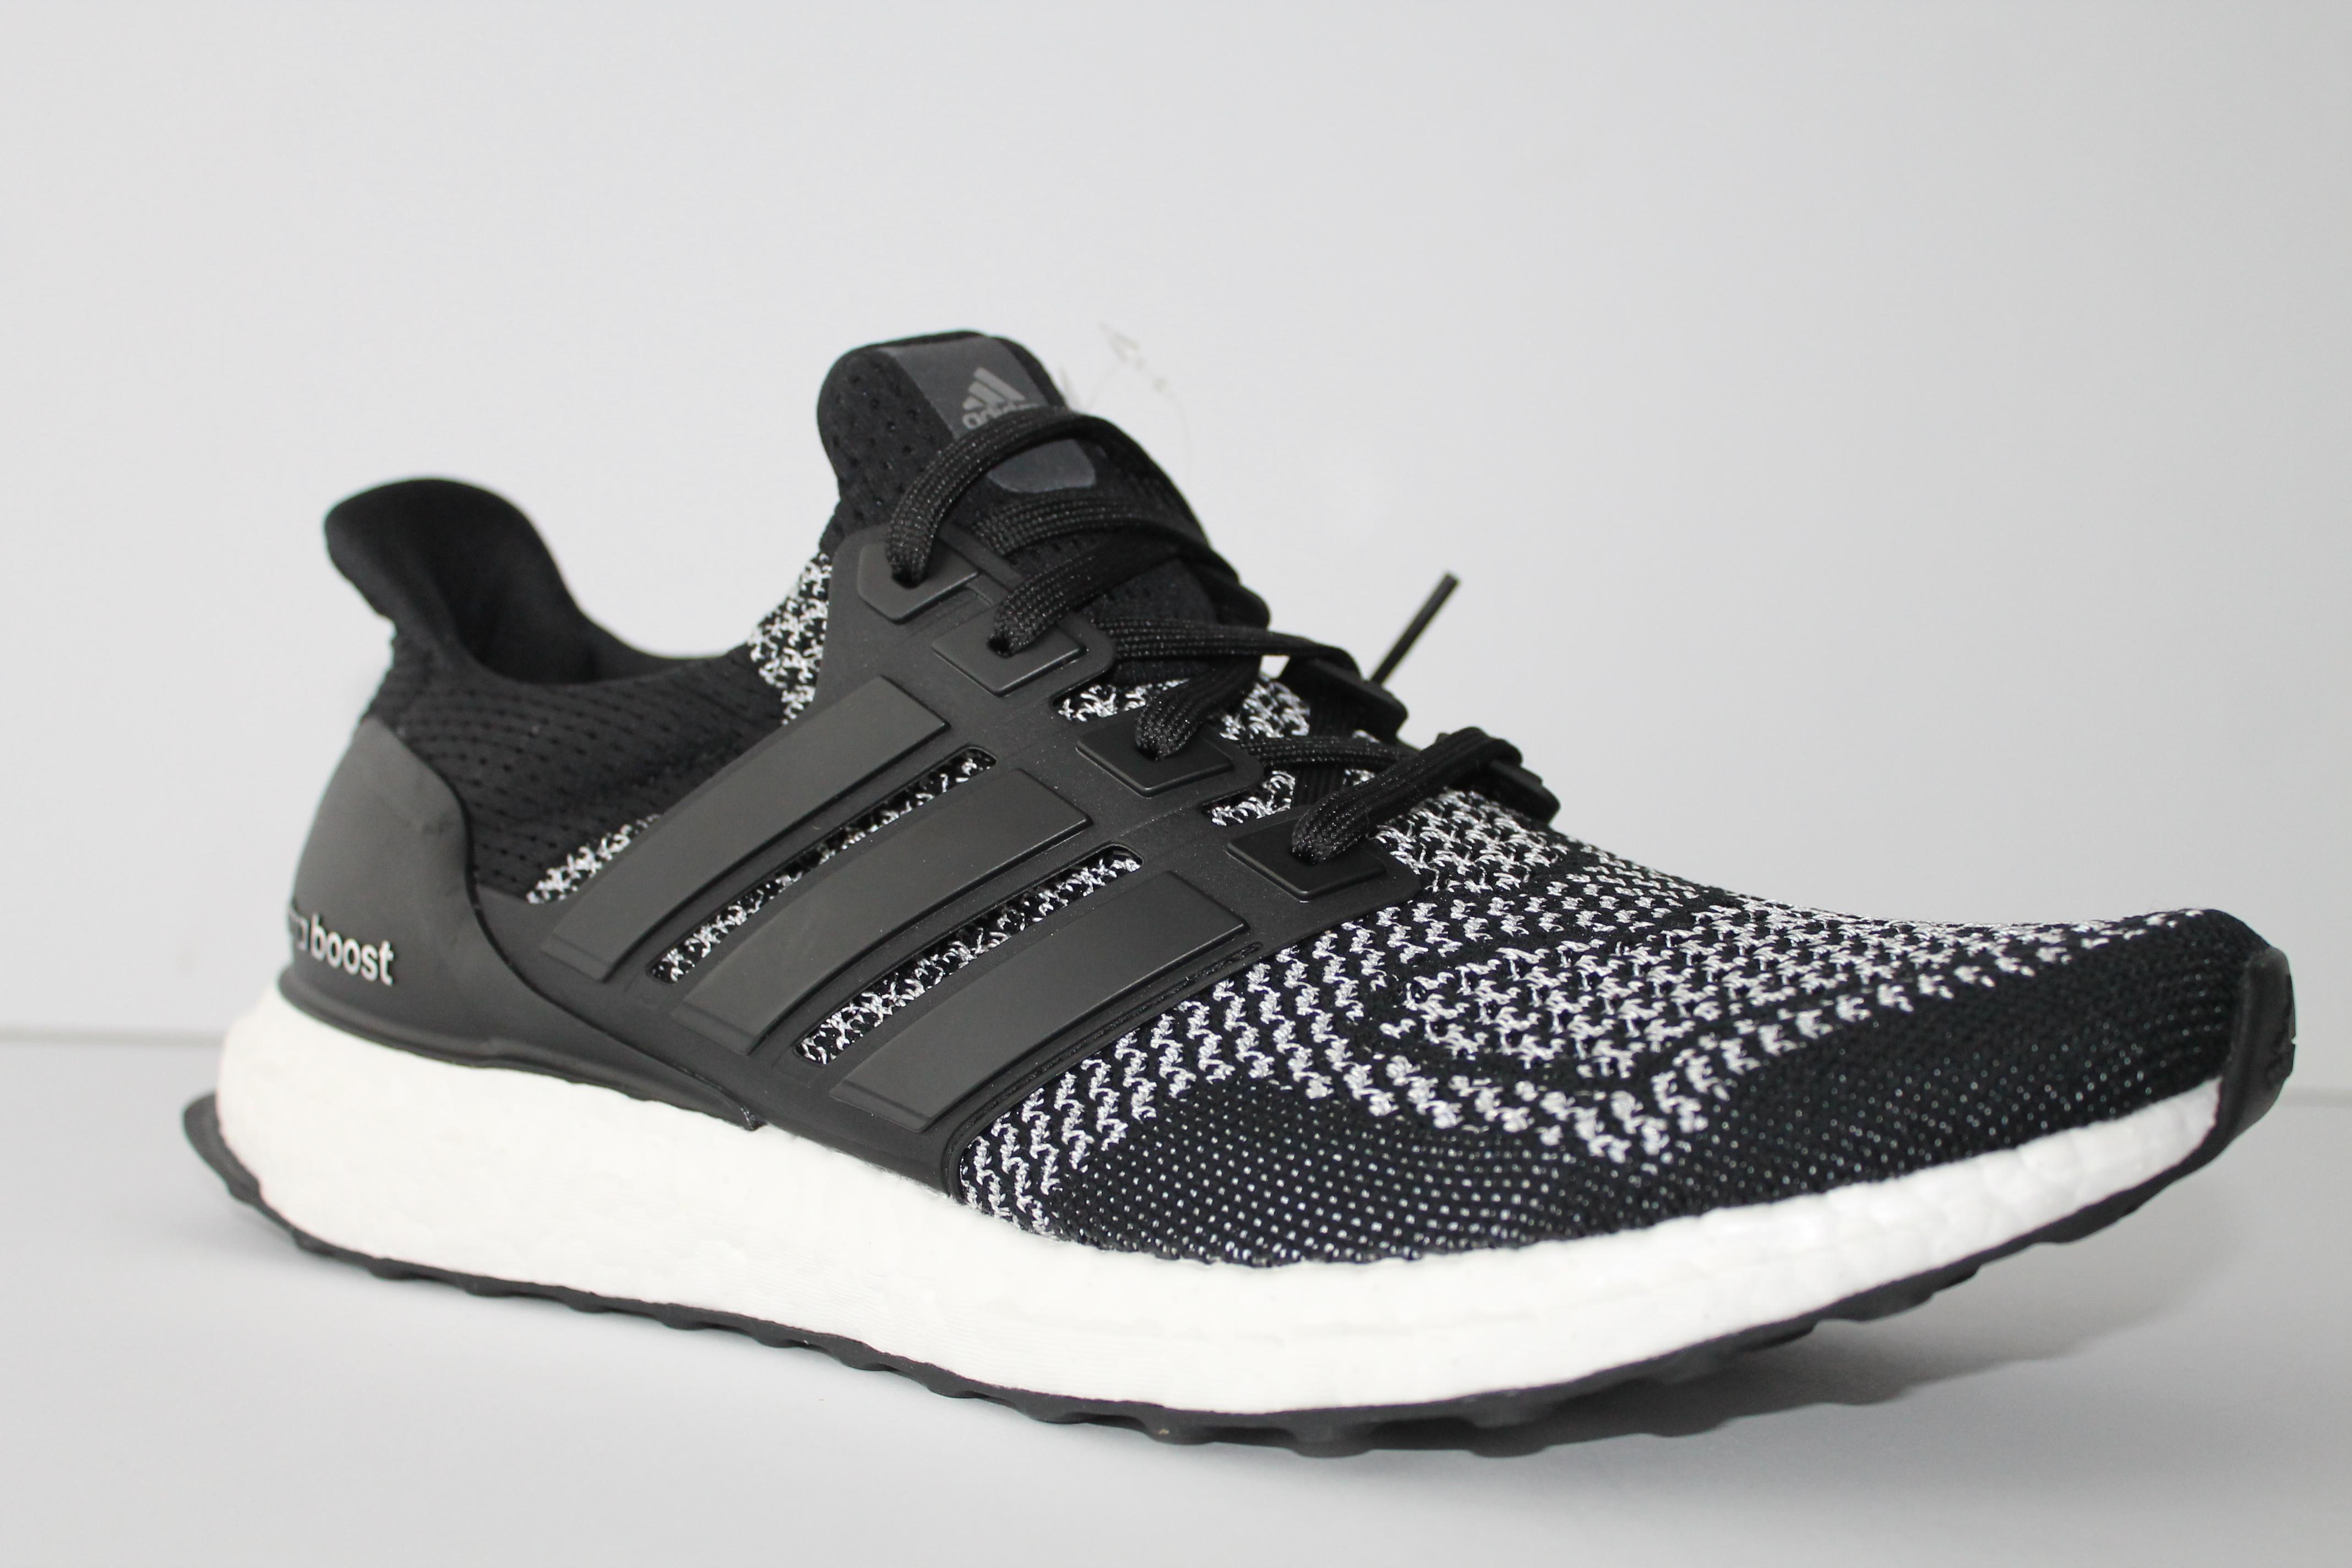 los angeles 25b27 0582b ... Adidas Ultra Boost LTD – 3M Reflective Black ...